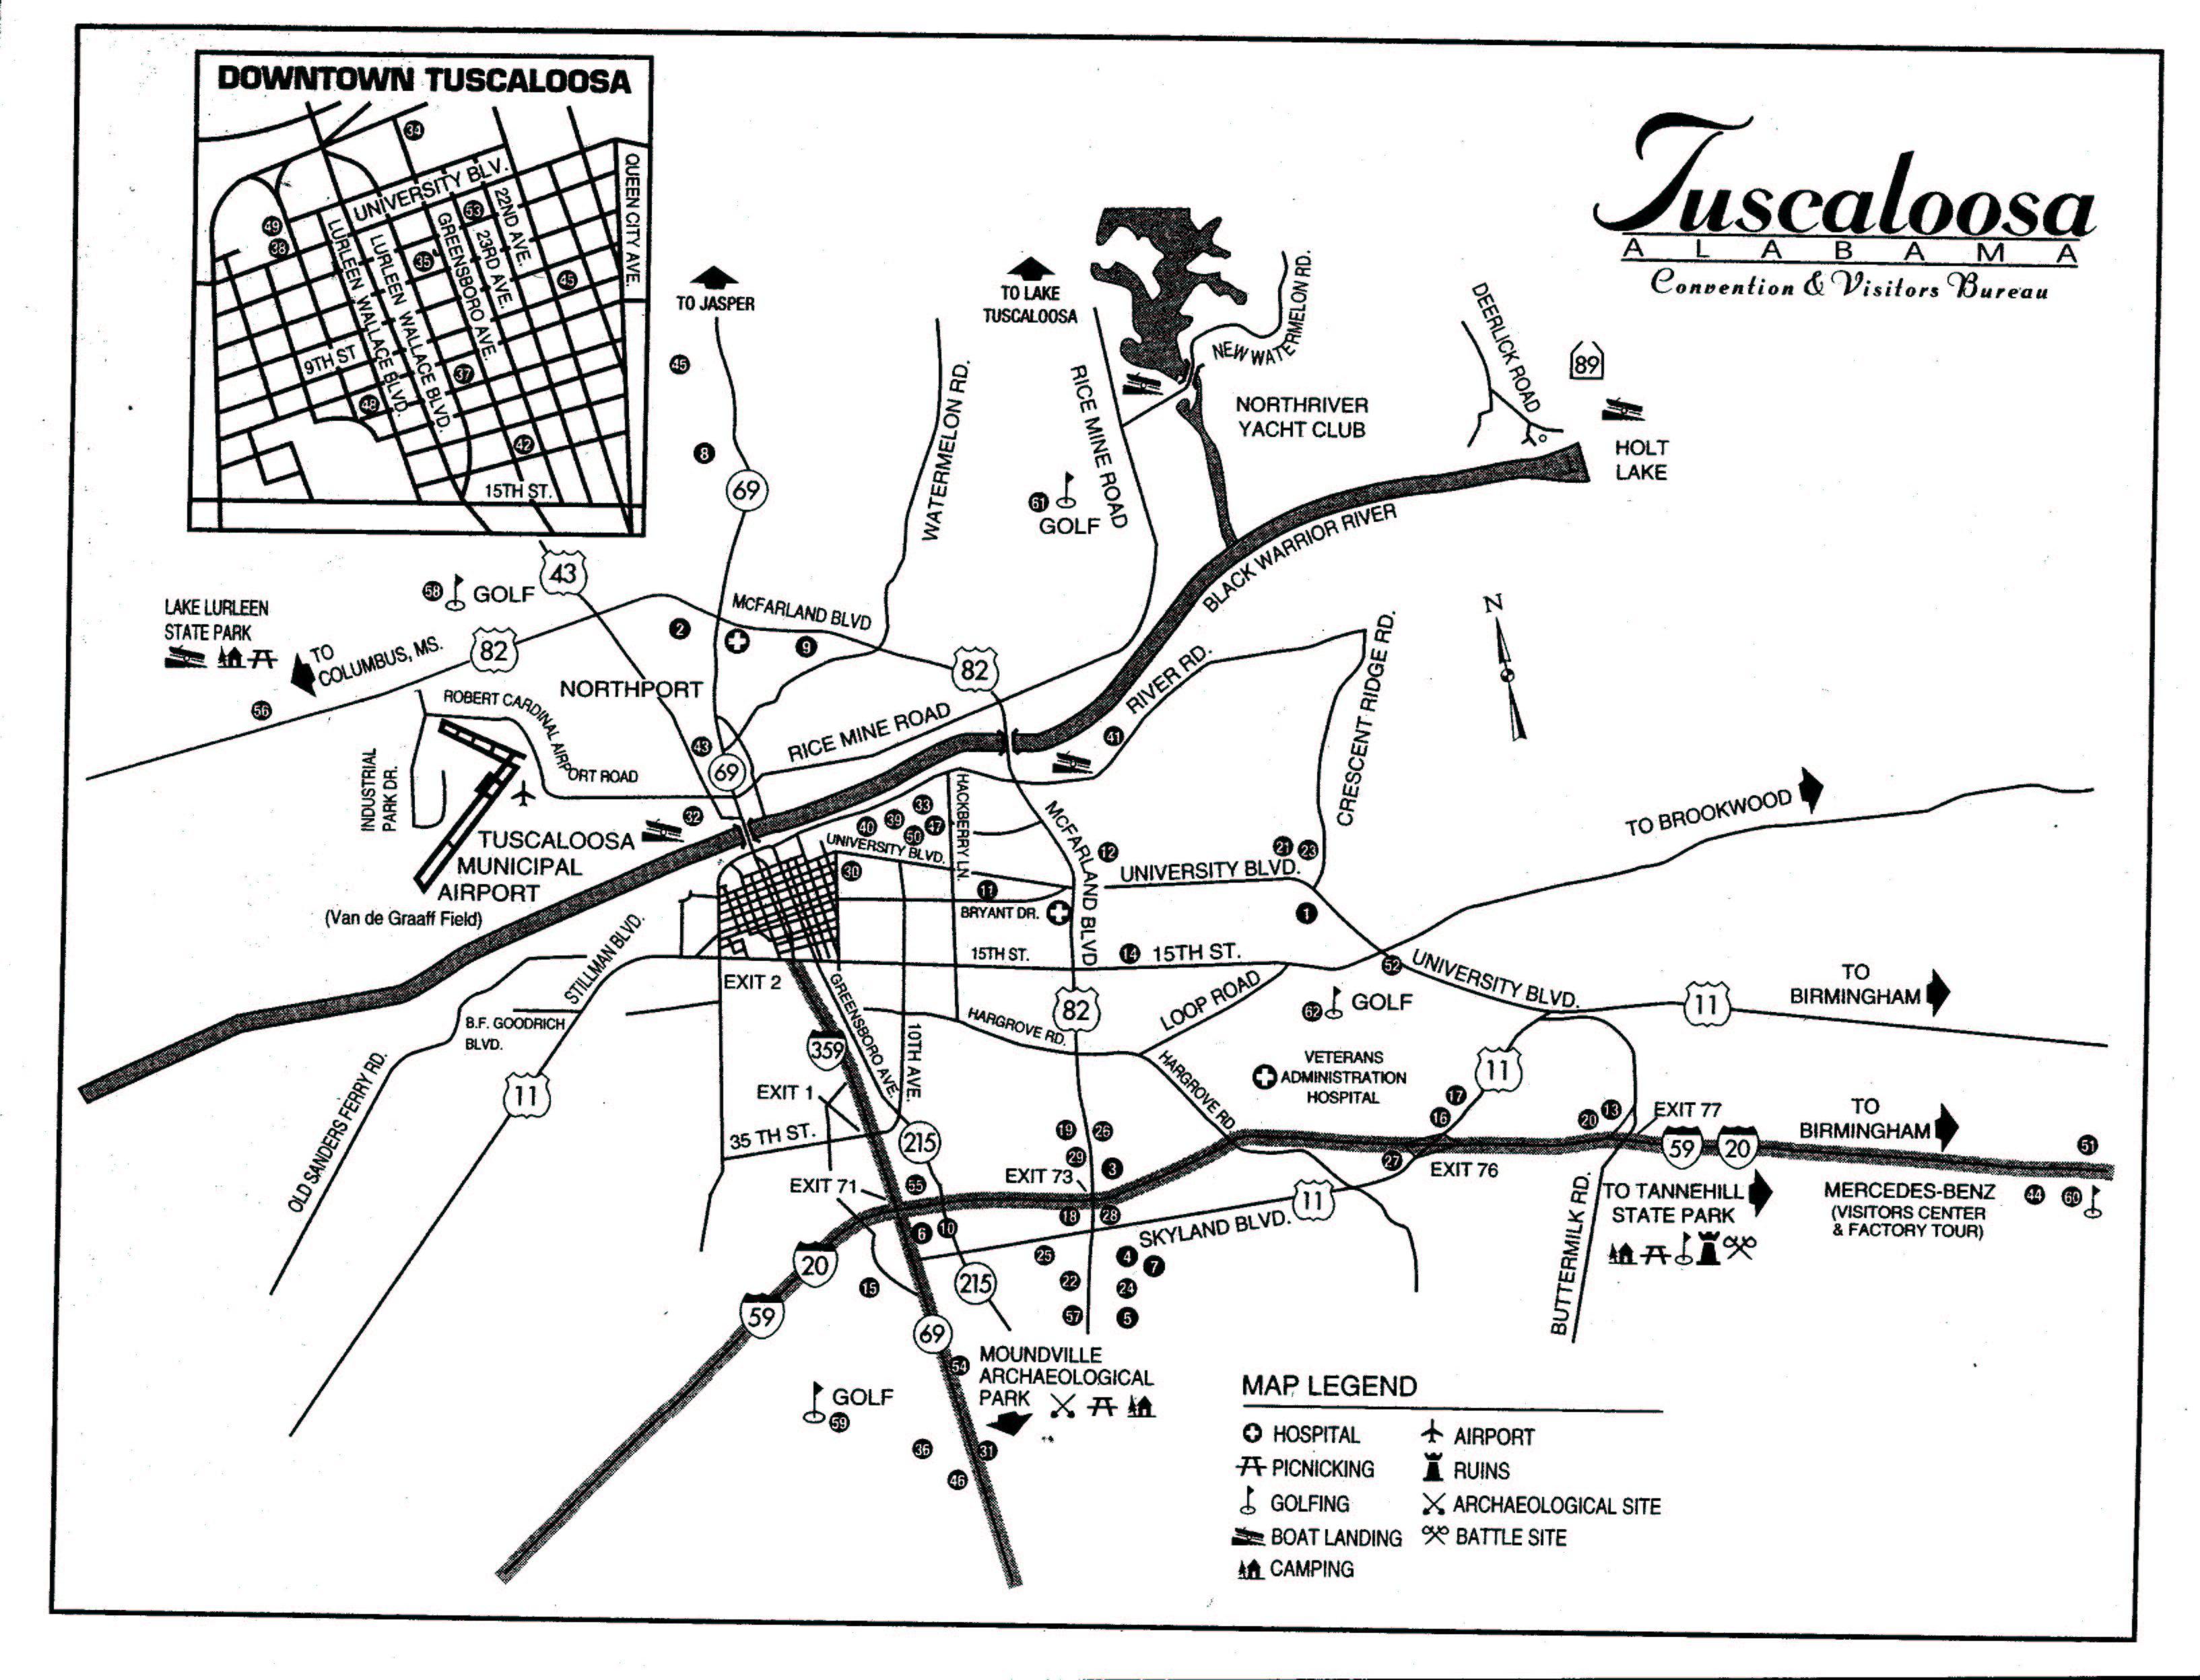 Tuscaloosa Map Tuscaloosa AL mappery